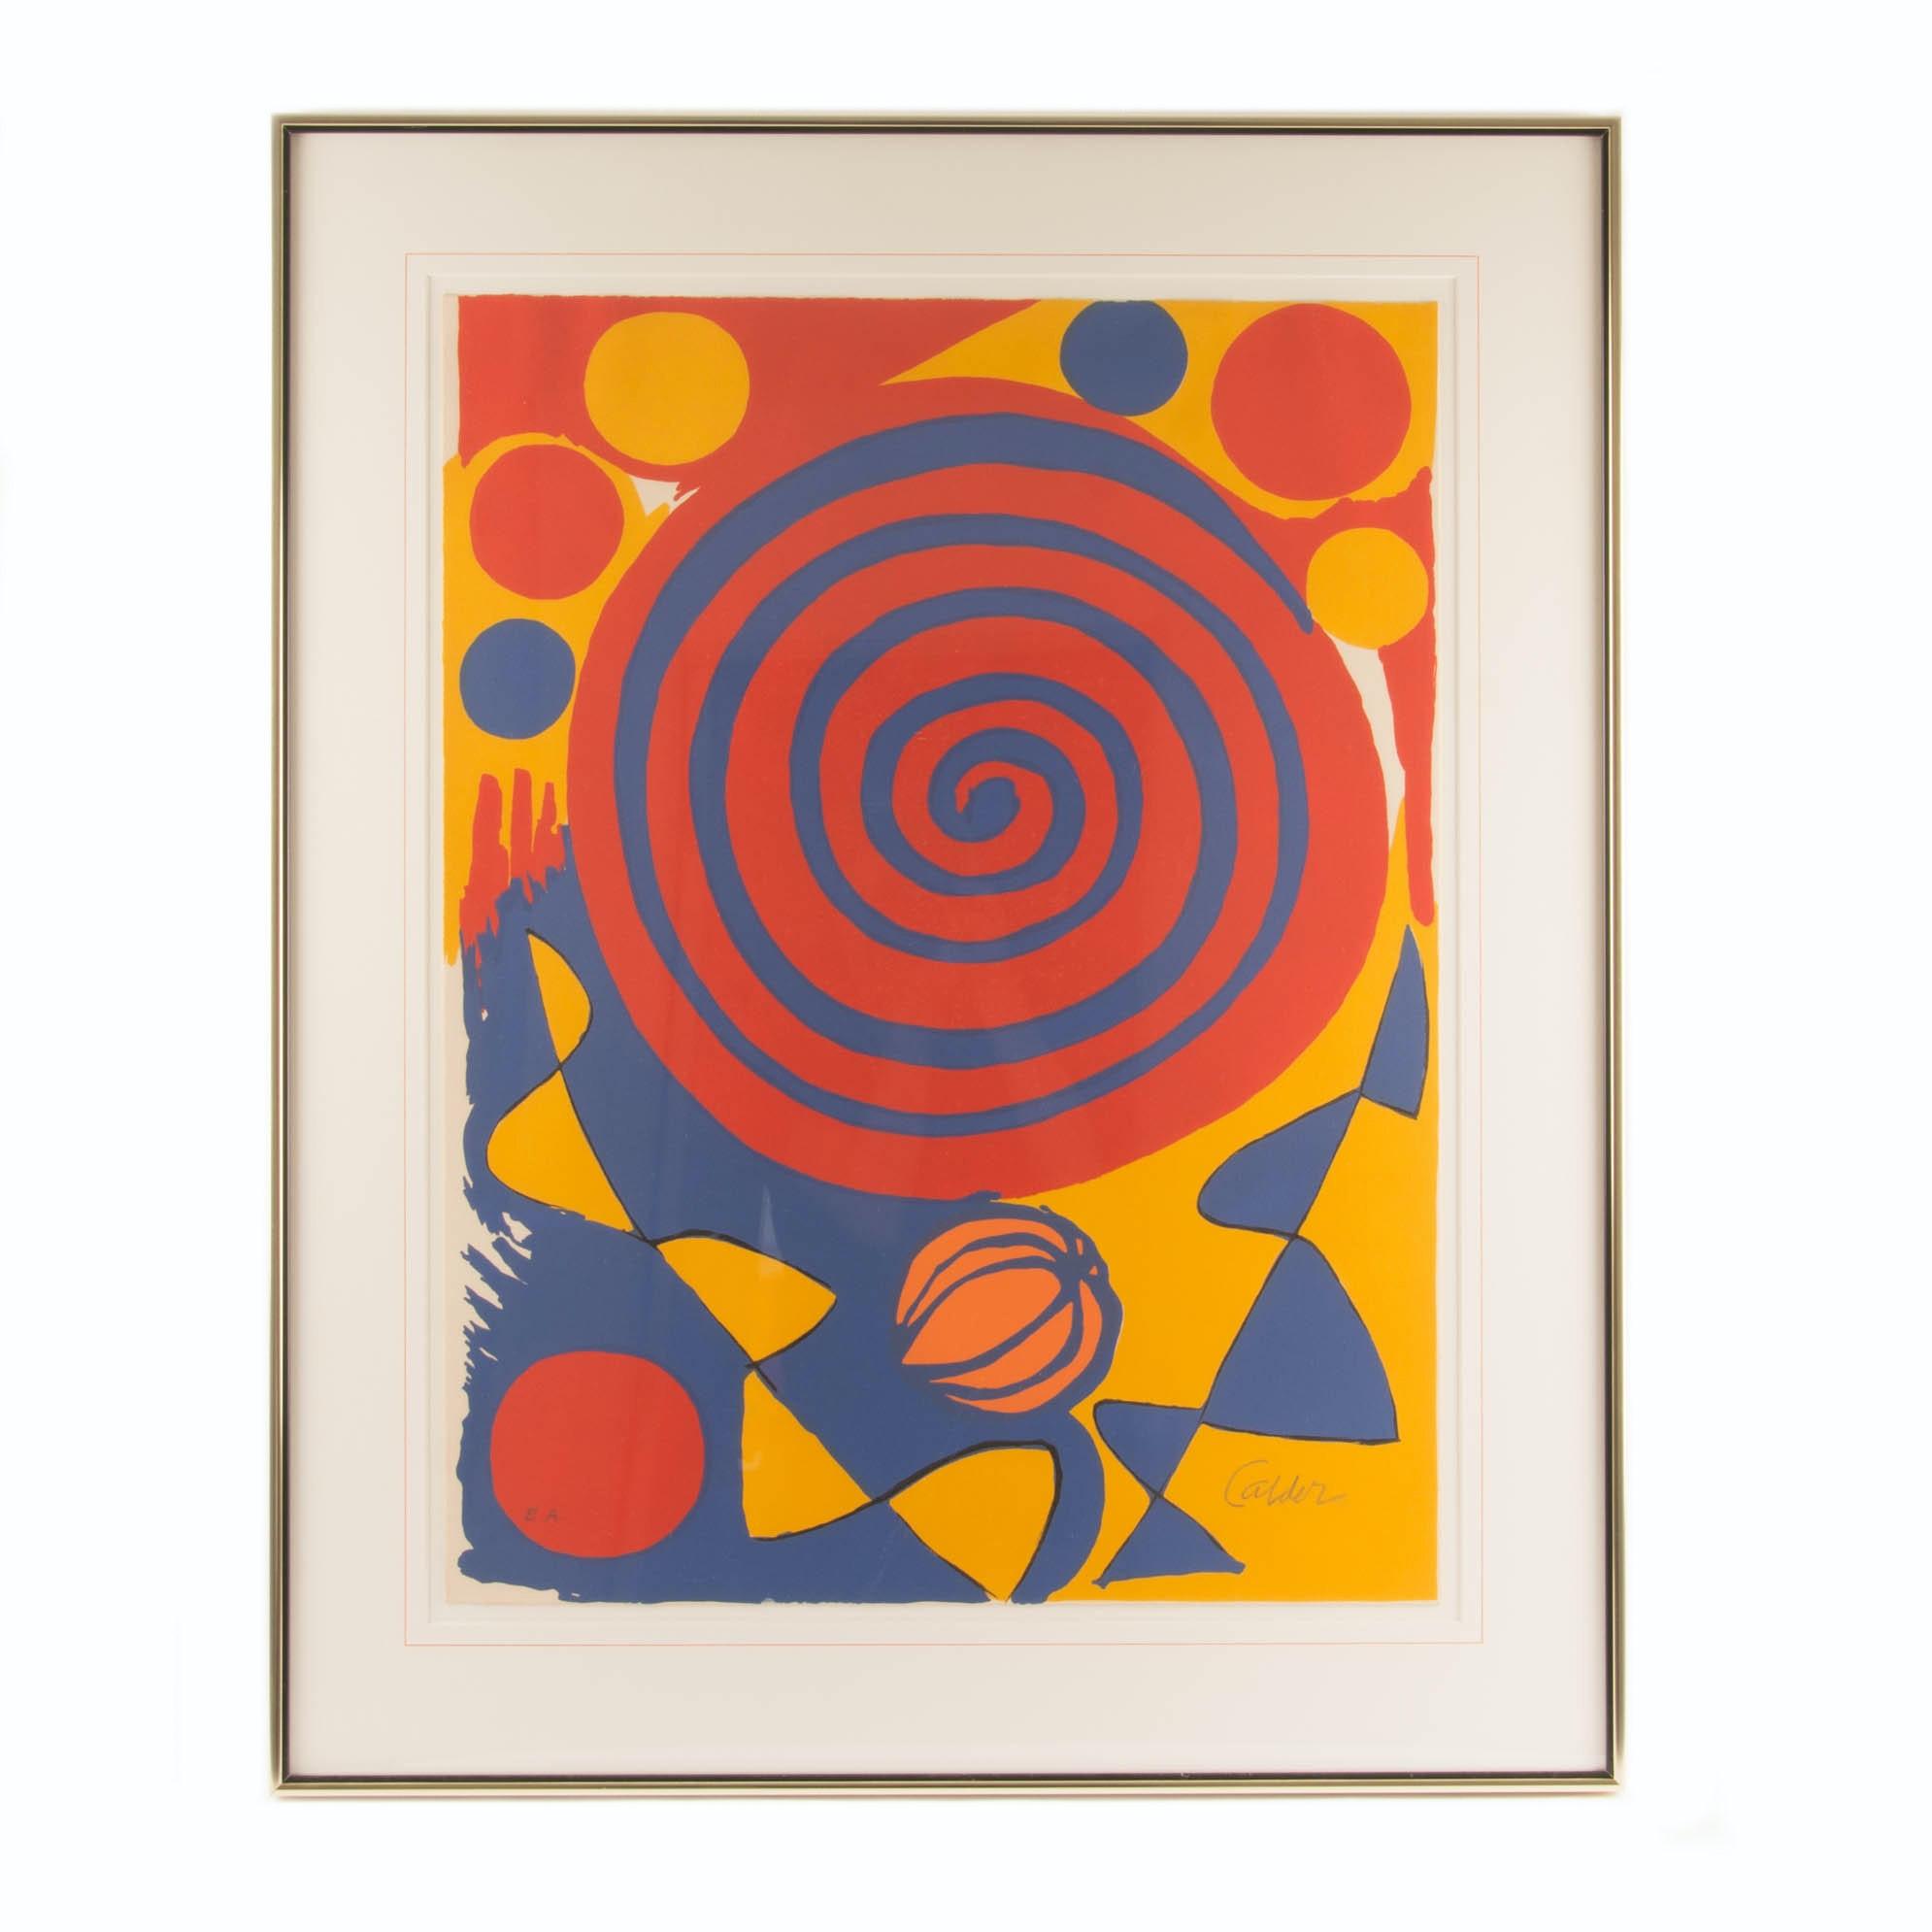 Alexander Calder Signed Lithograph Print